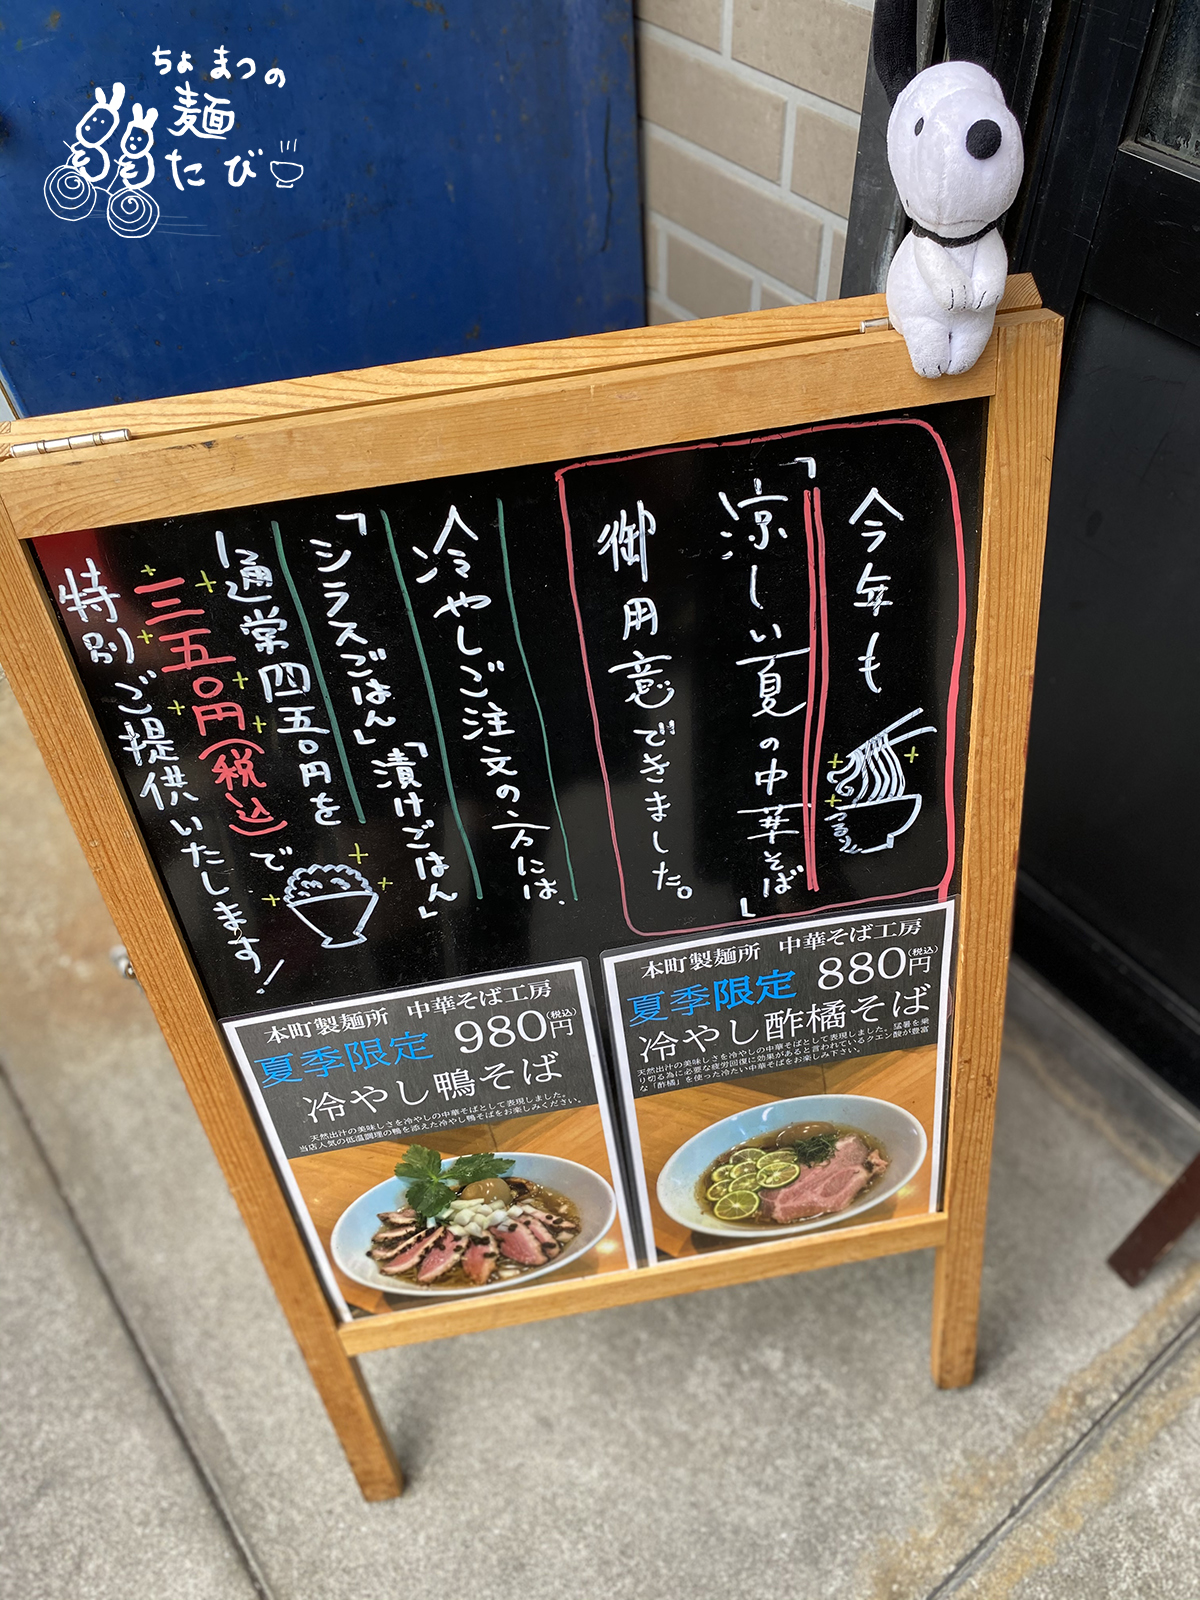 本町製麺所 阿倍野卸売工場 中華そば工房 看板